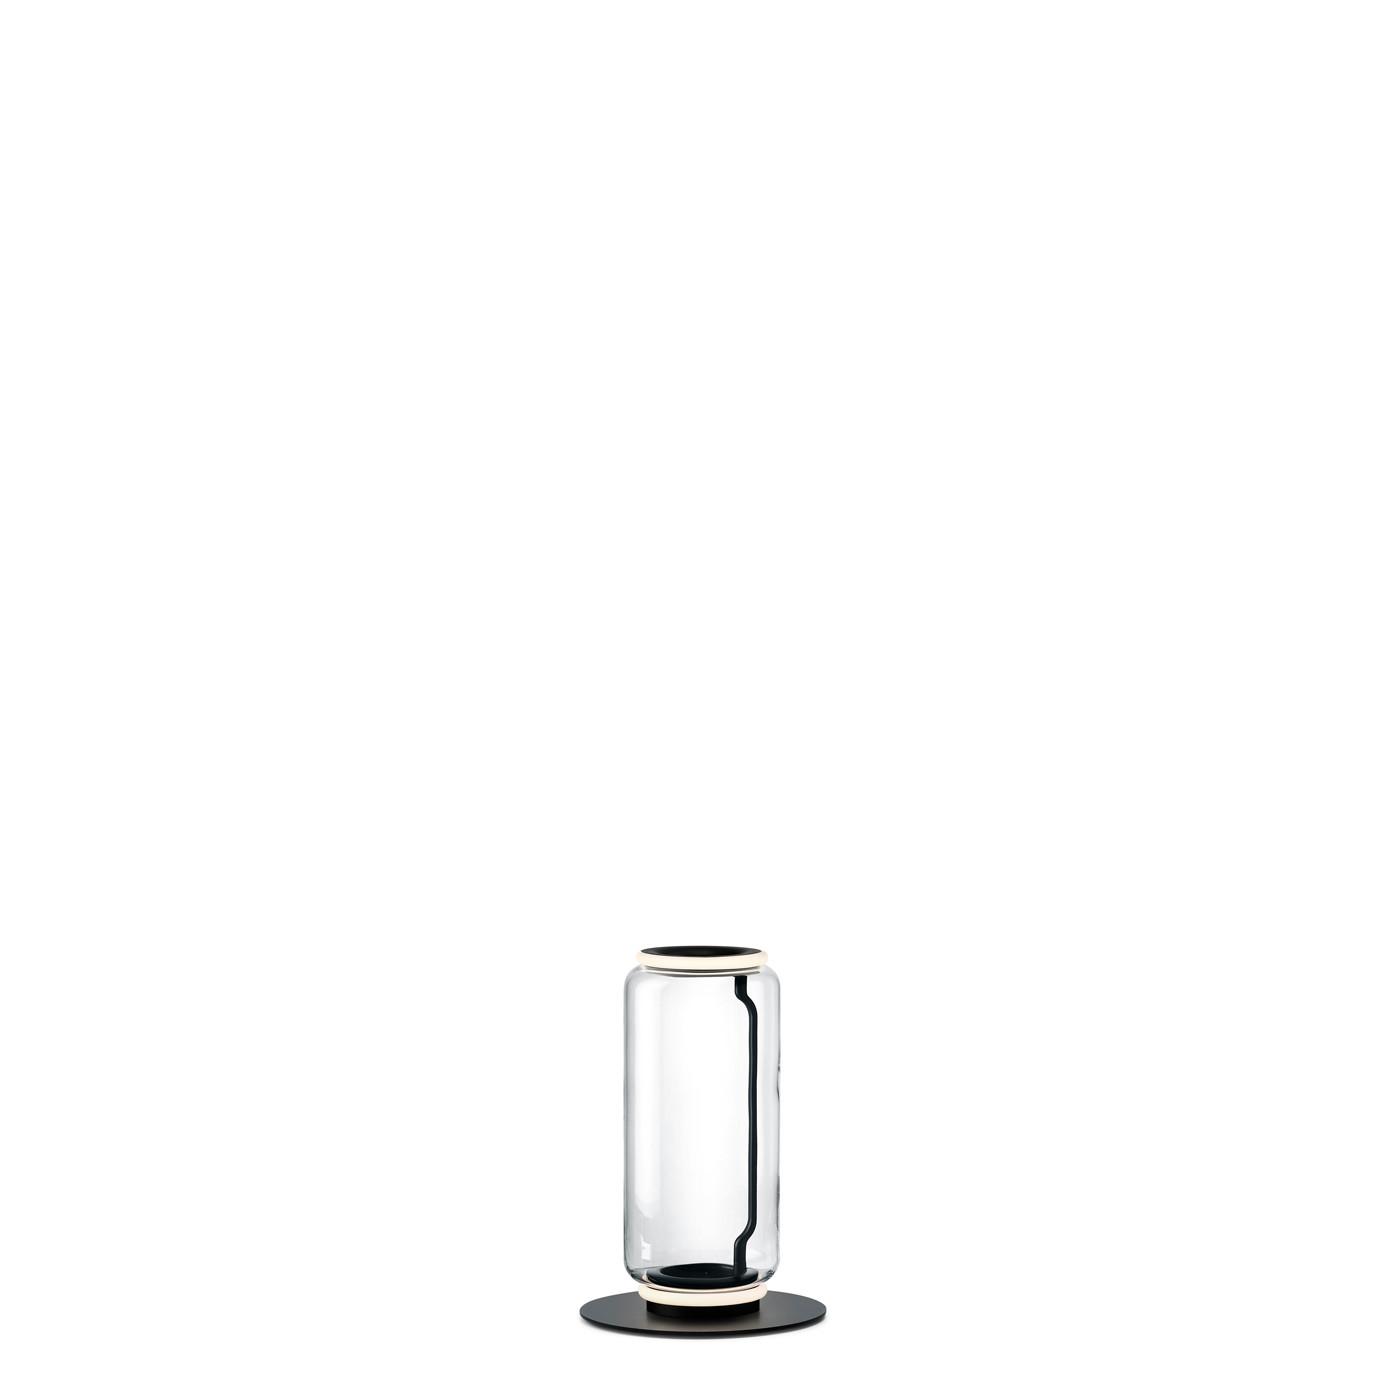 Flos Noctambule High Cylinders F LED